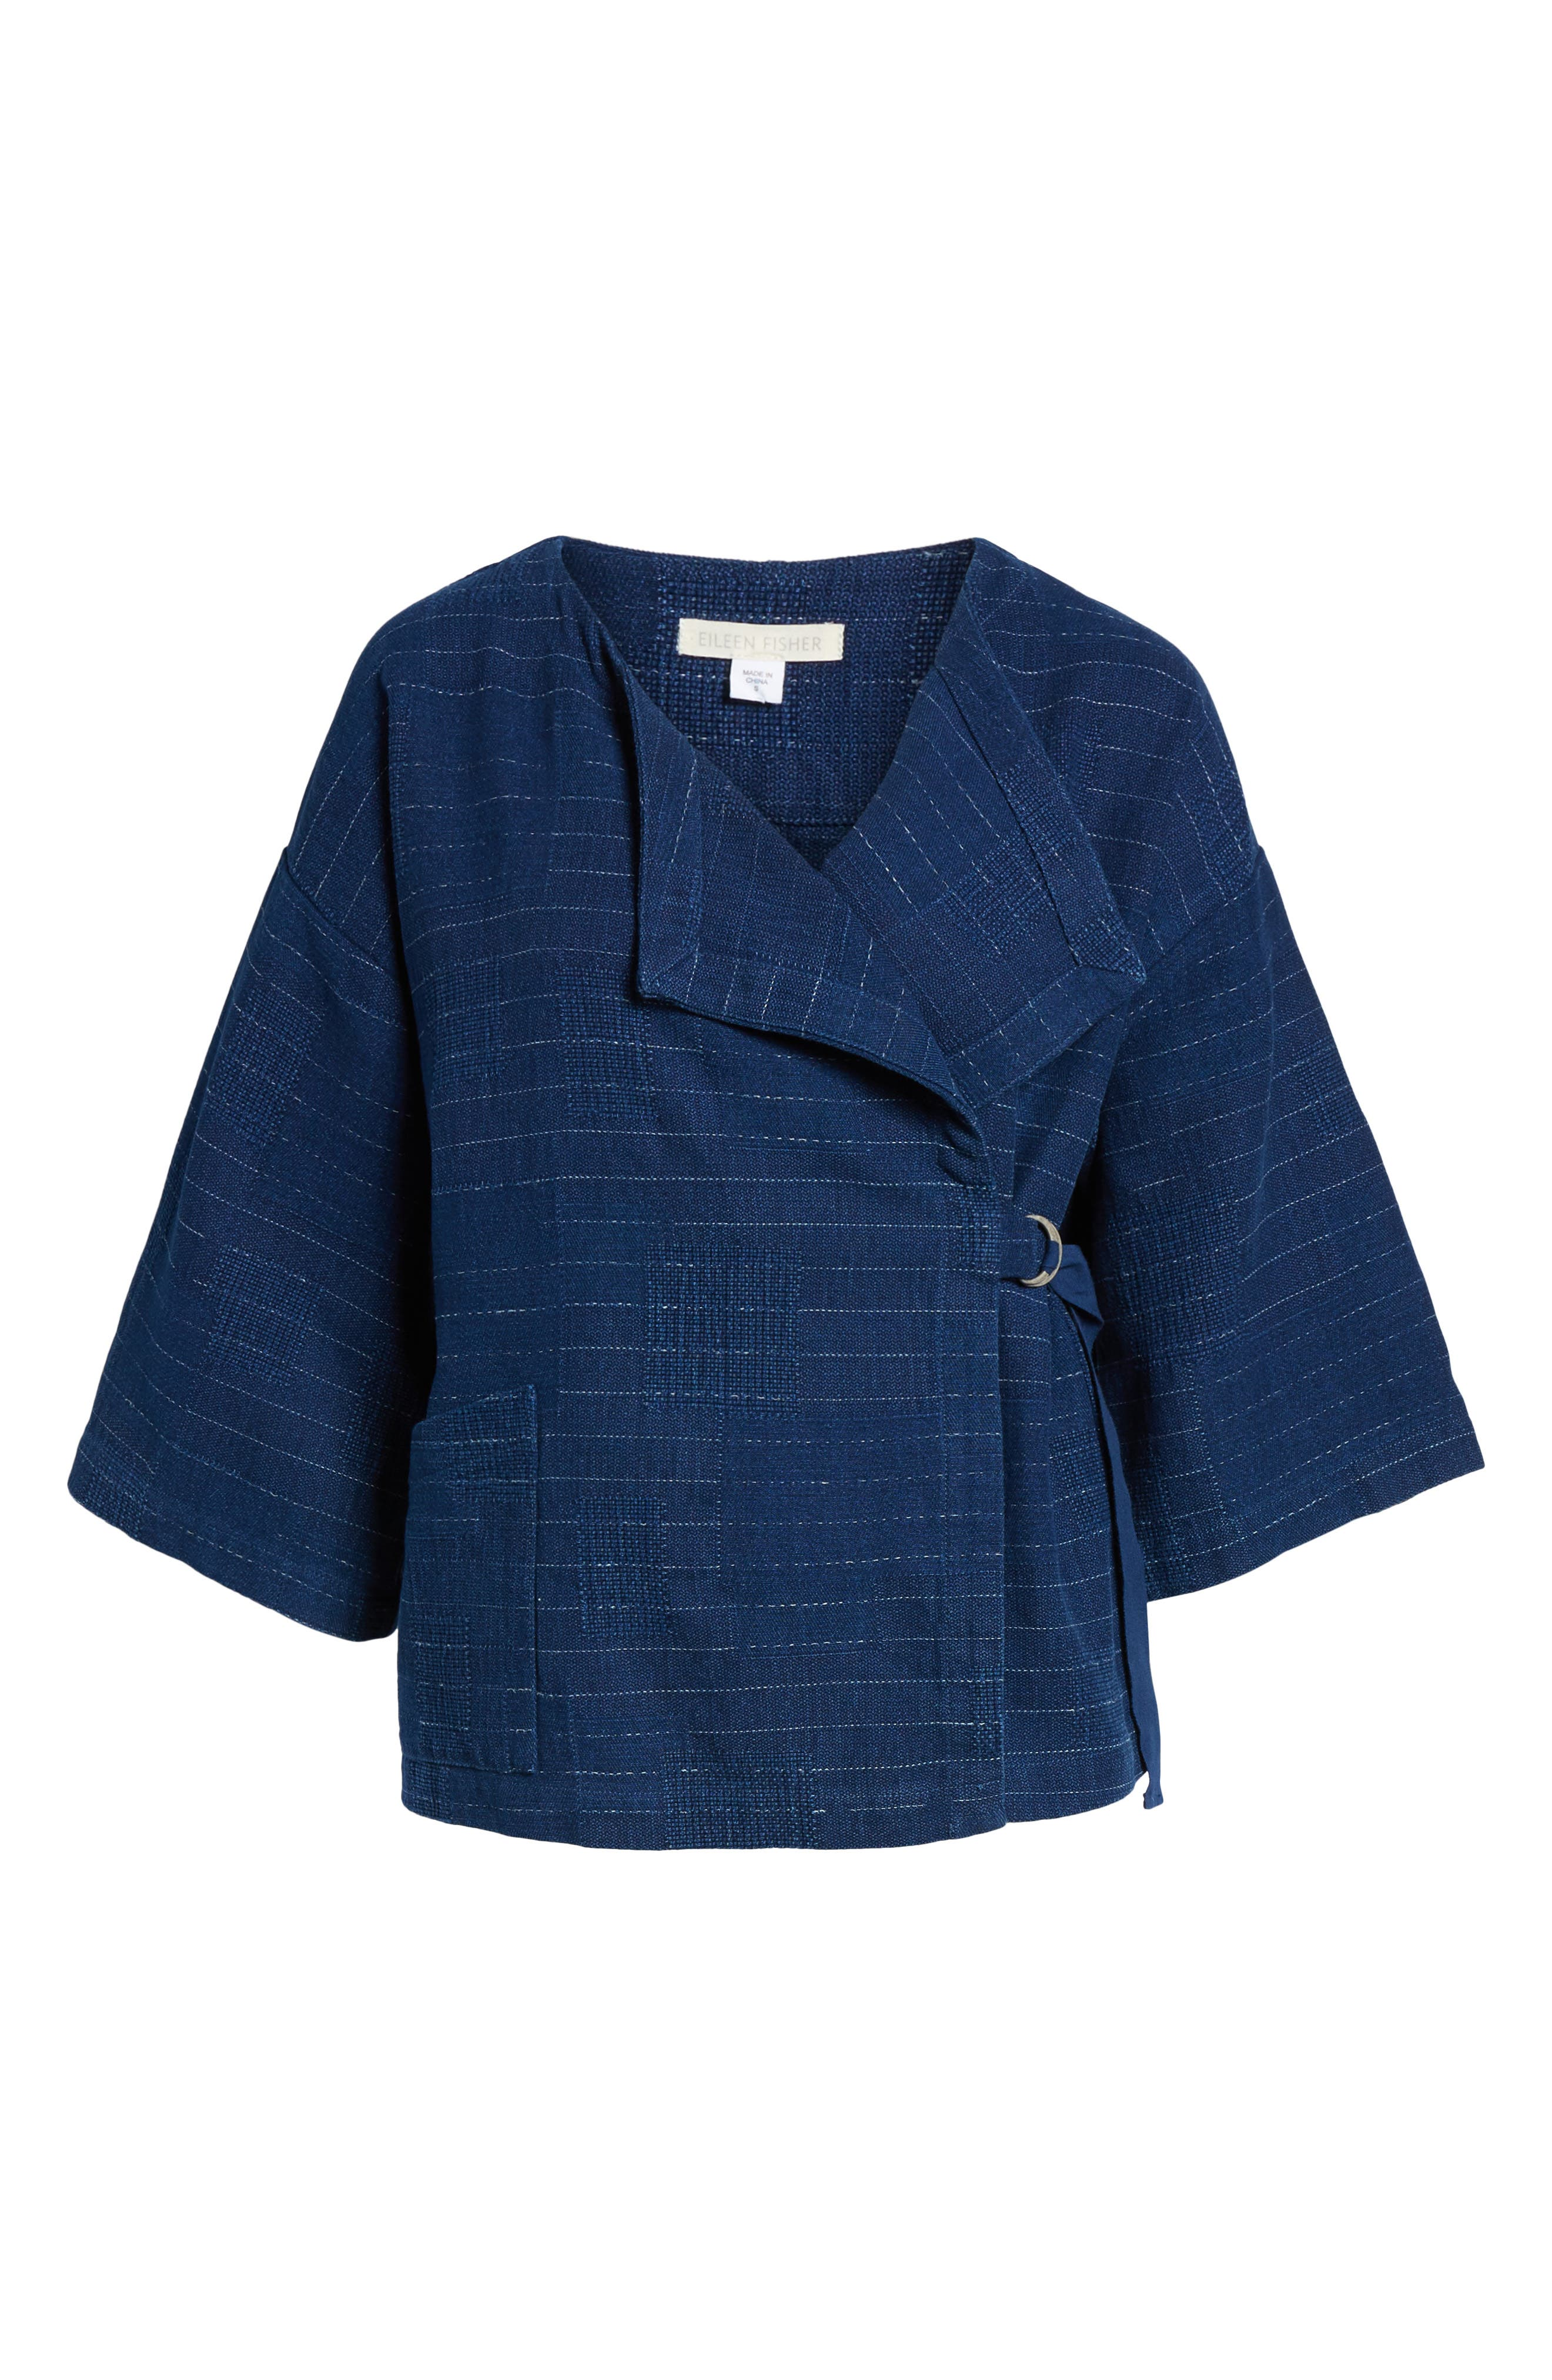 Belted Kimono Jacket,                             Alternate thumbnail 6, color,                             402